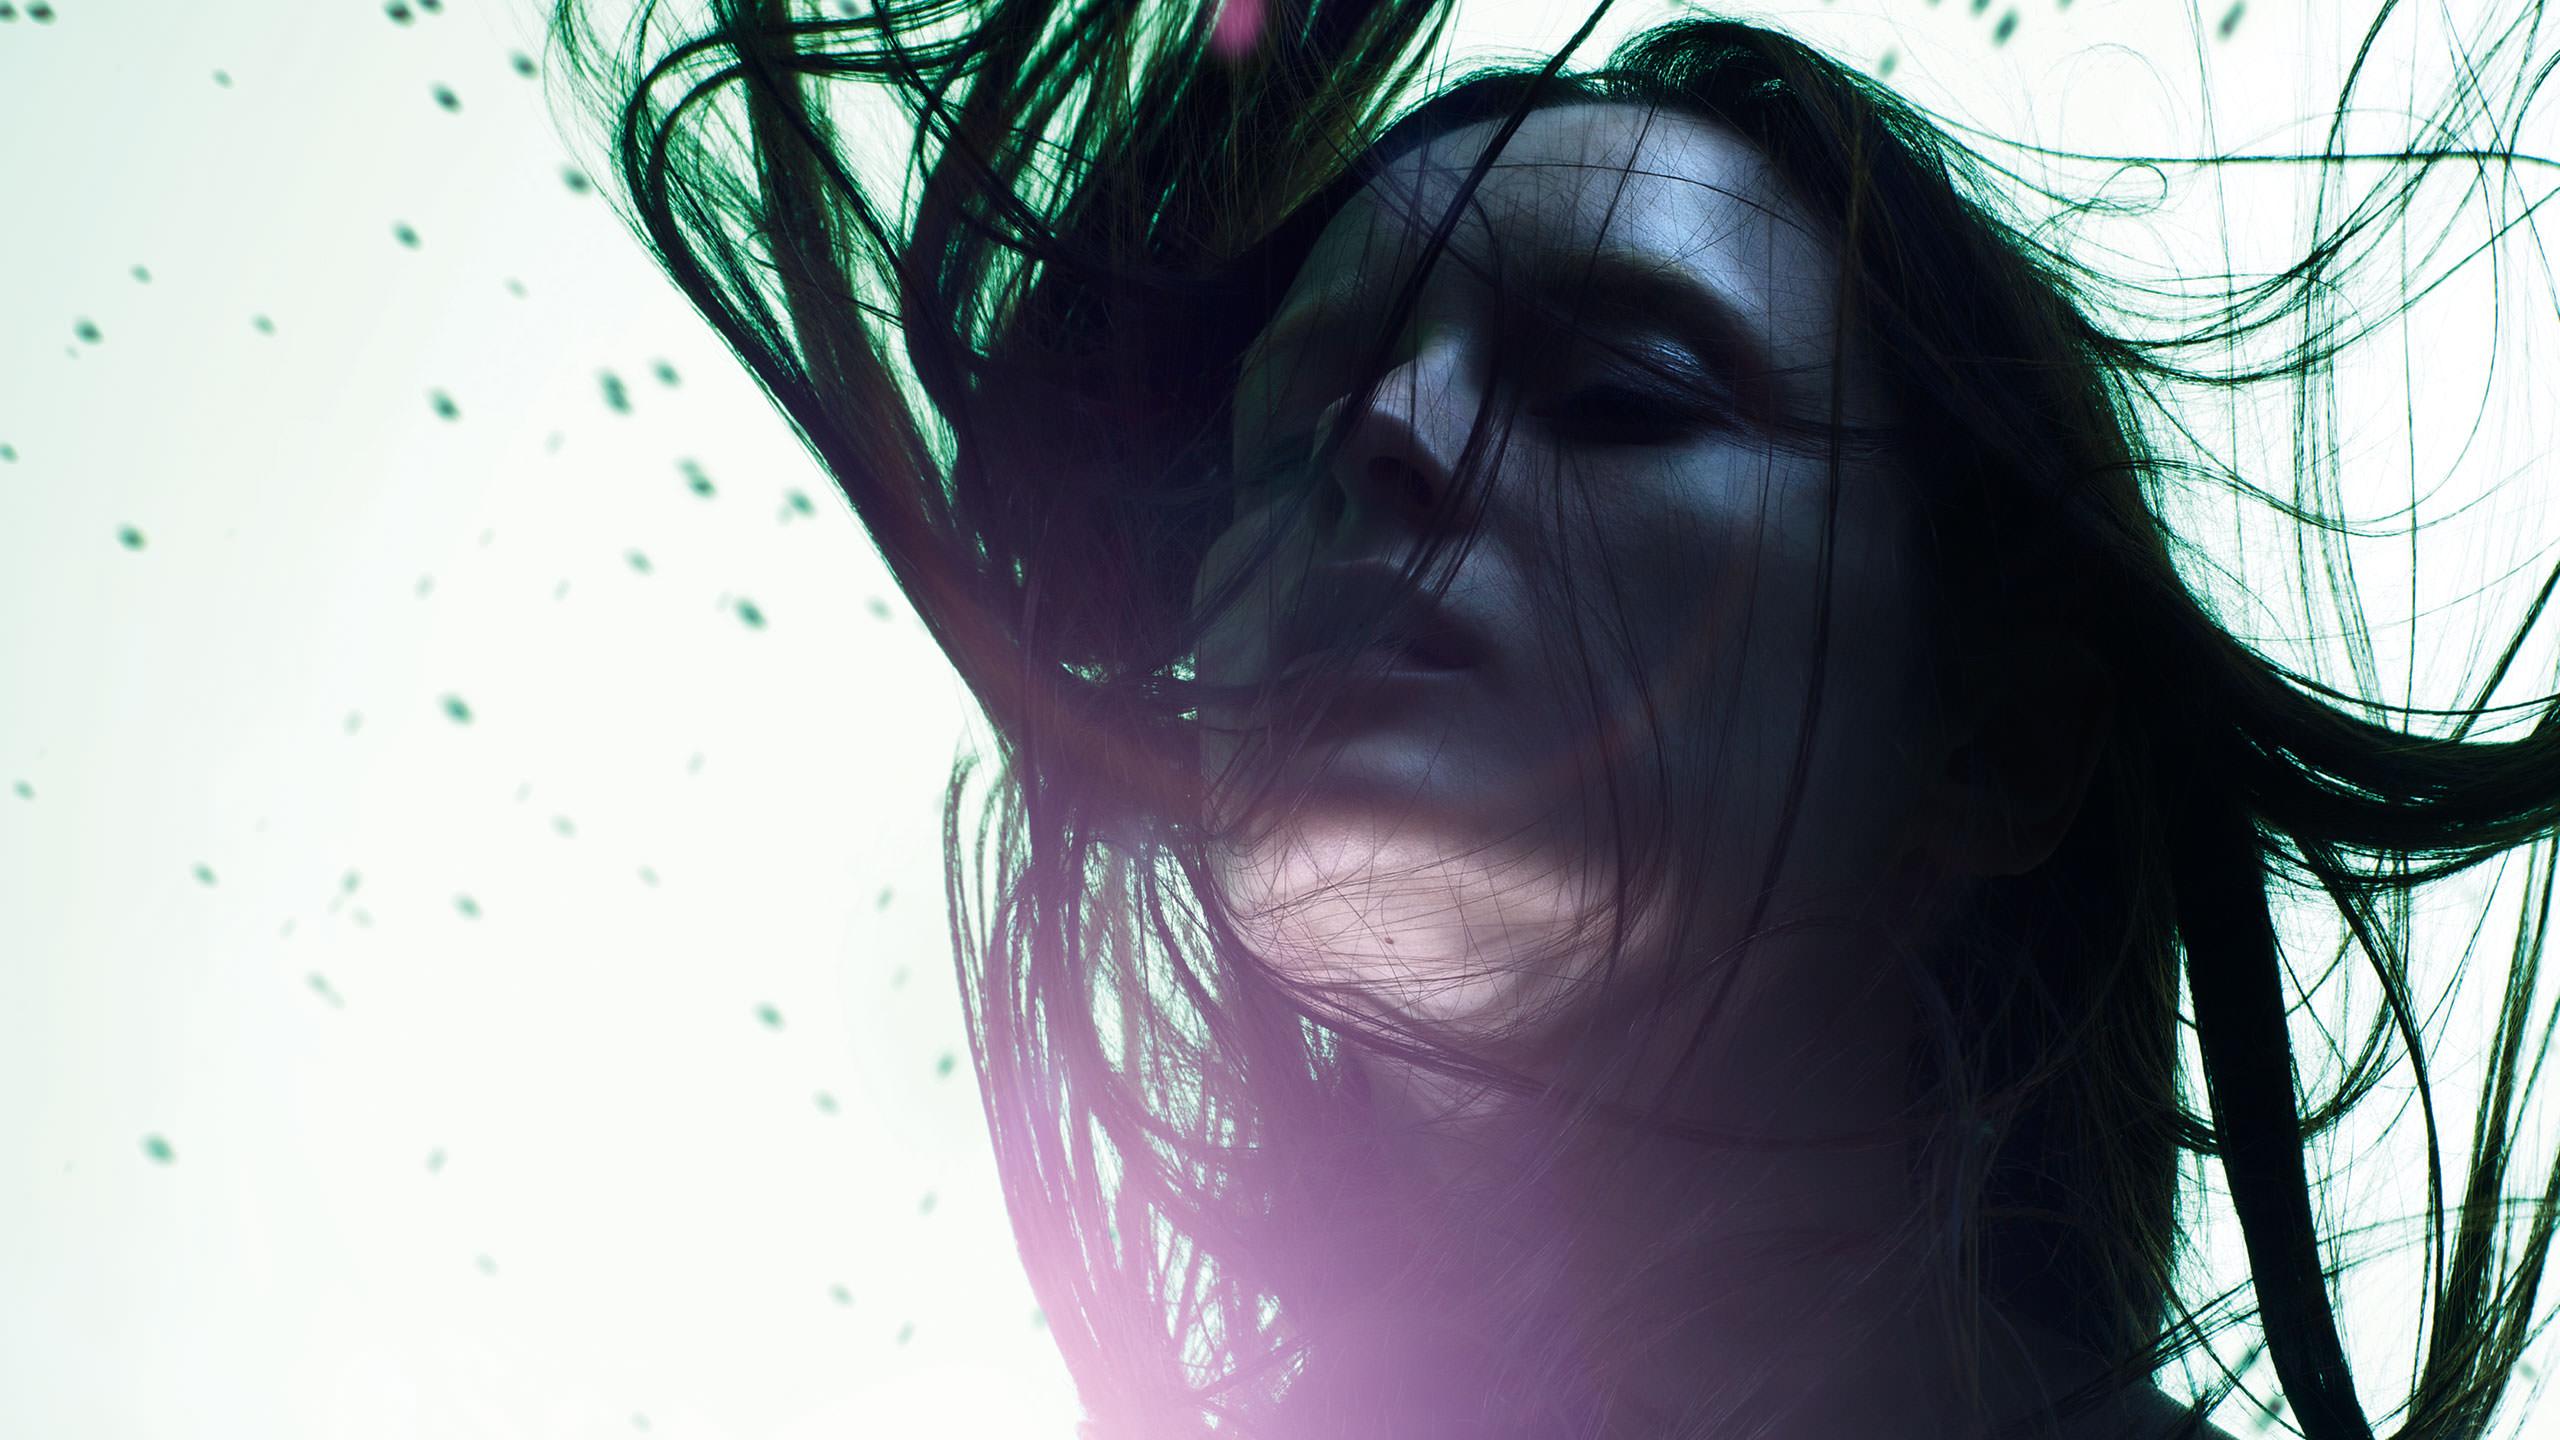 Sephora Retail Photo - Face Green